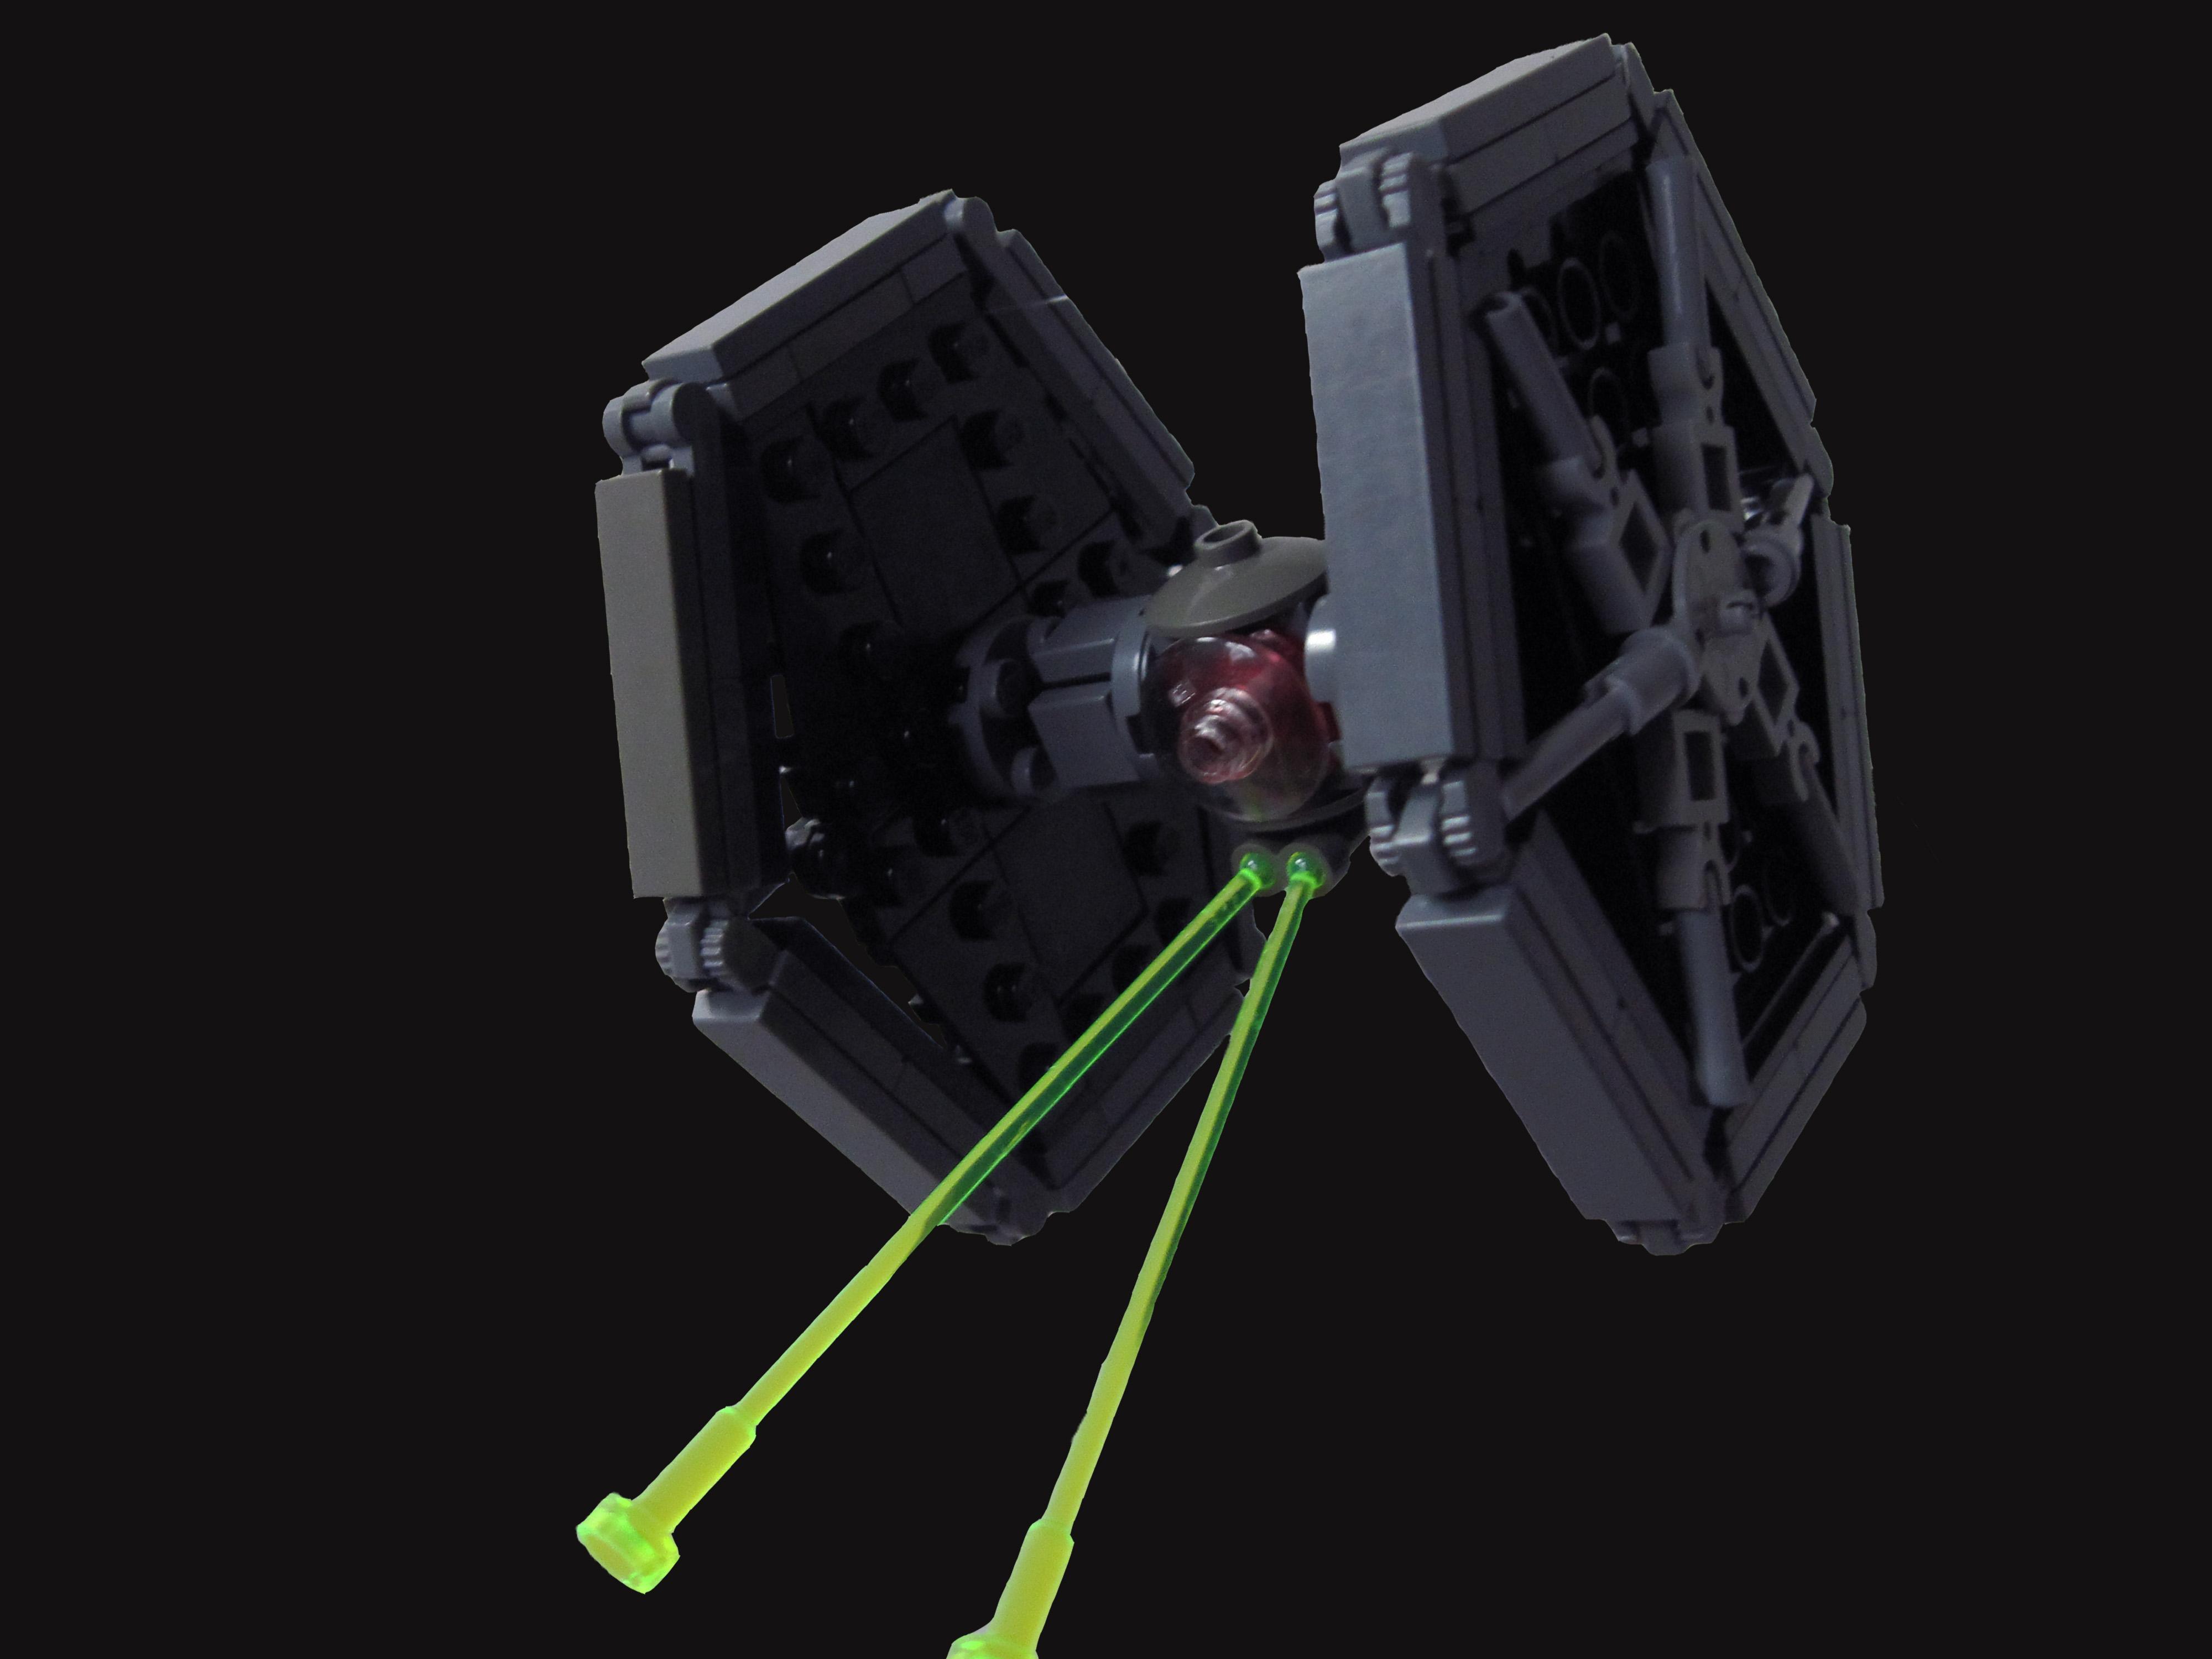 Hintergrundbilder : Feld, LEGO, Asteroid, Krawatte, Hoth, Mini ...